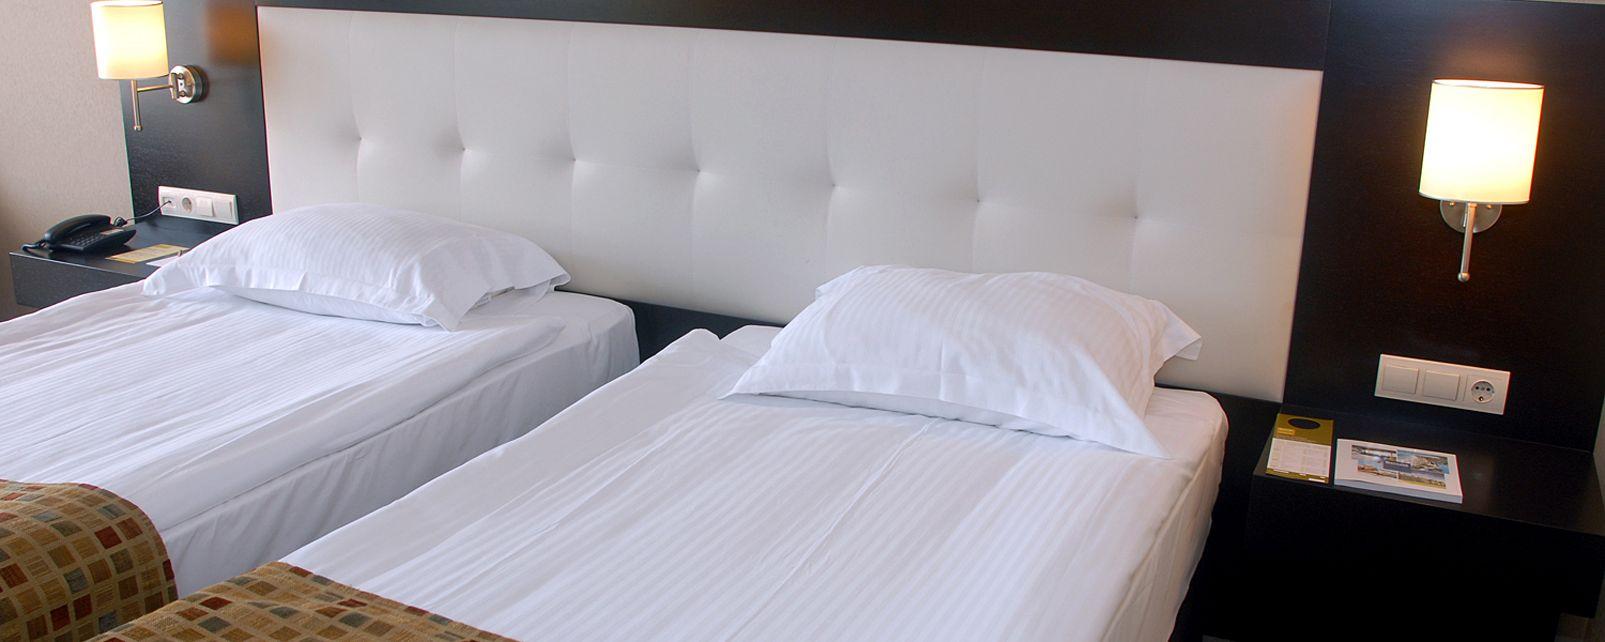 هتل بارسلو ایریسین توپکاپی استانبول